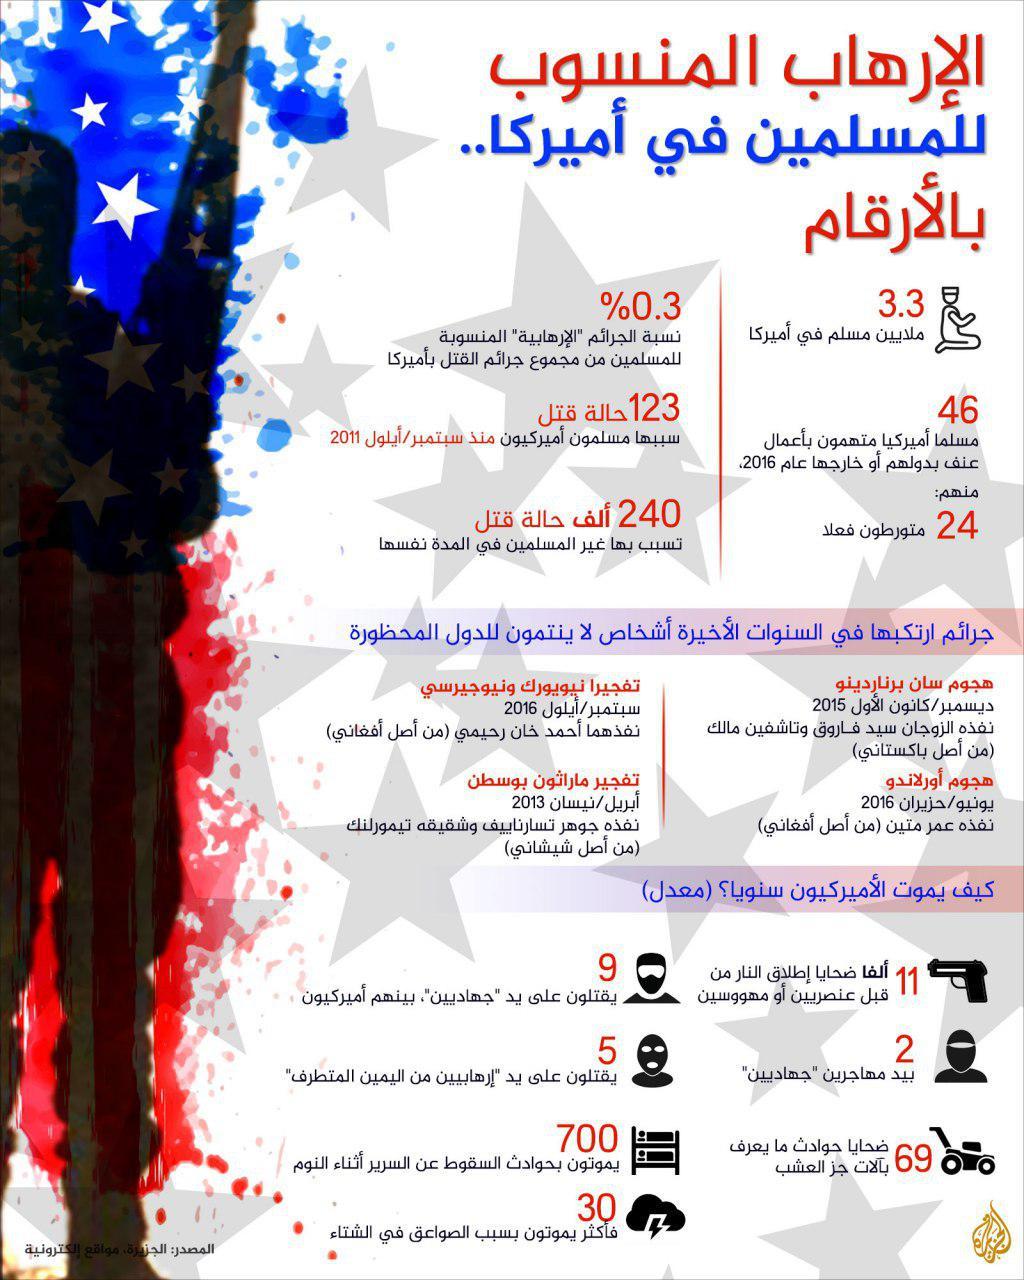 Photo of كيف يموت الأمريكيون وما علاقة المسلمين بالإرهاب في الولايات المتحدة